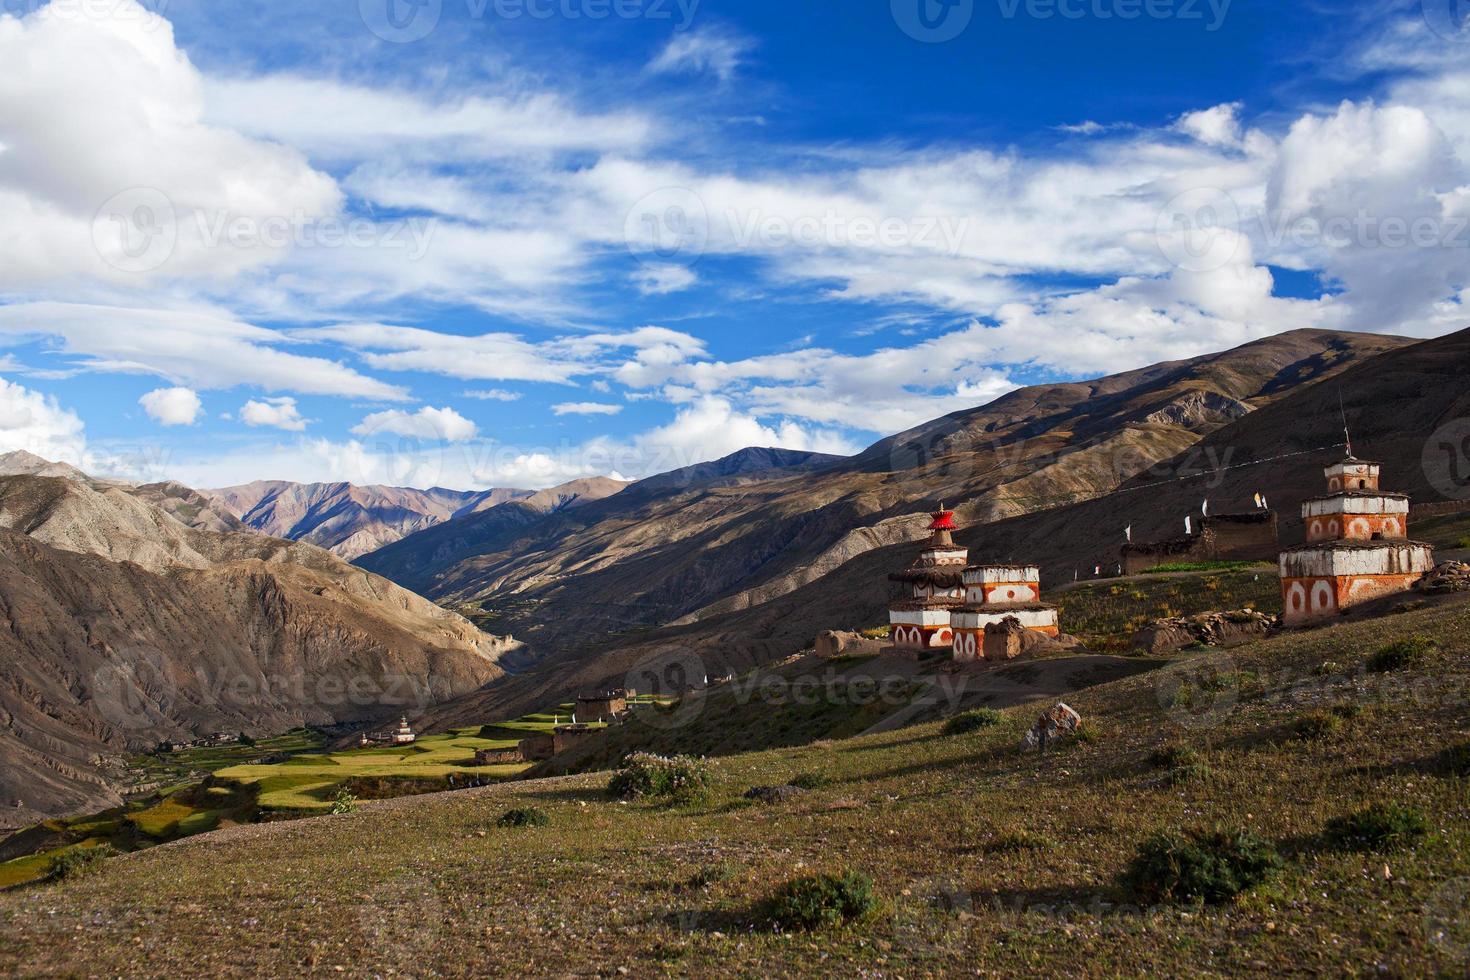 forntida bon stupa i saldang by, nepal foto